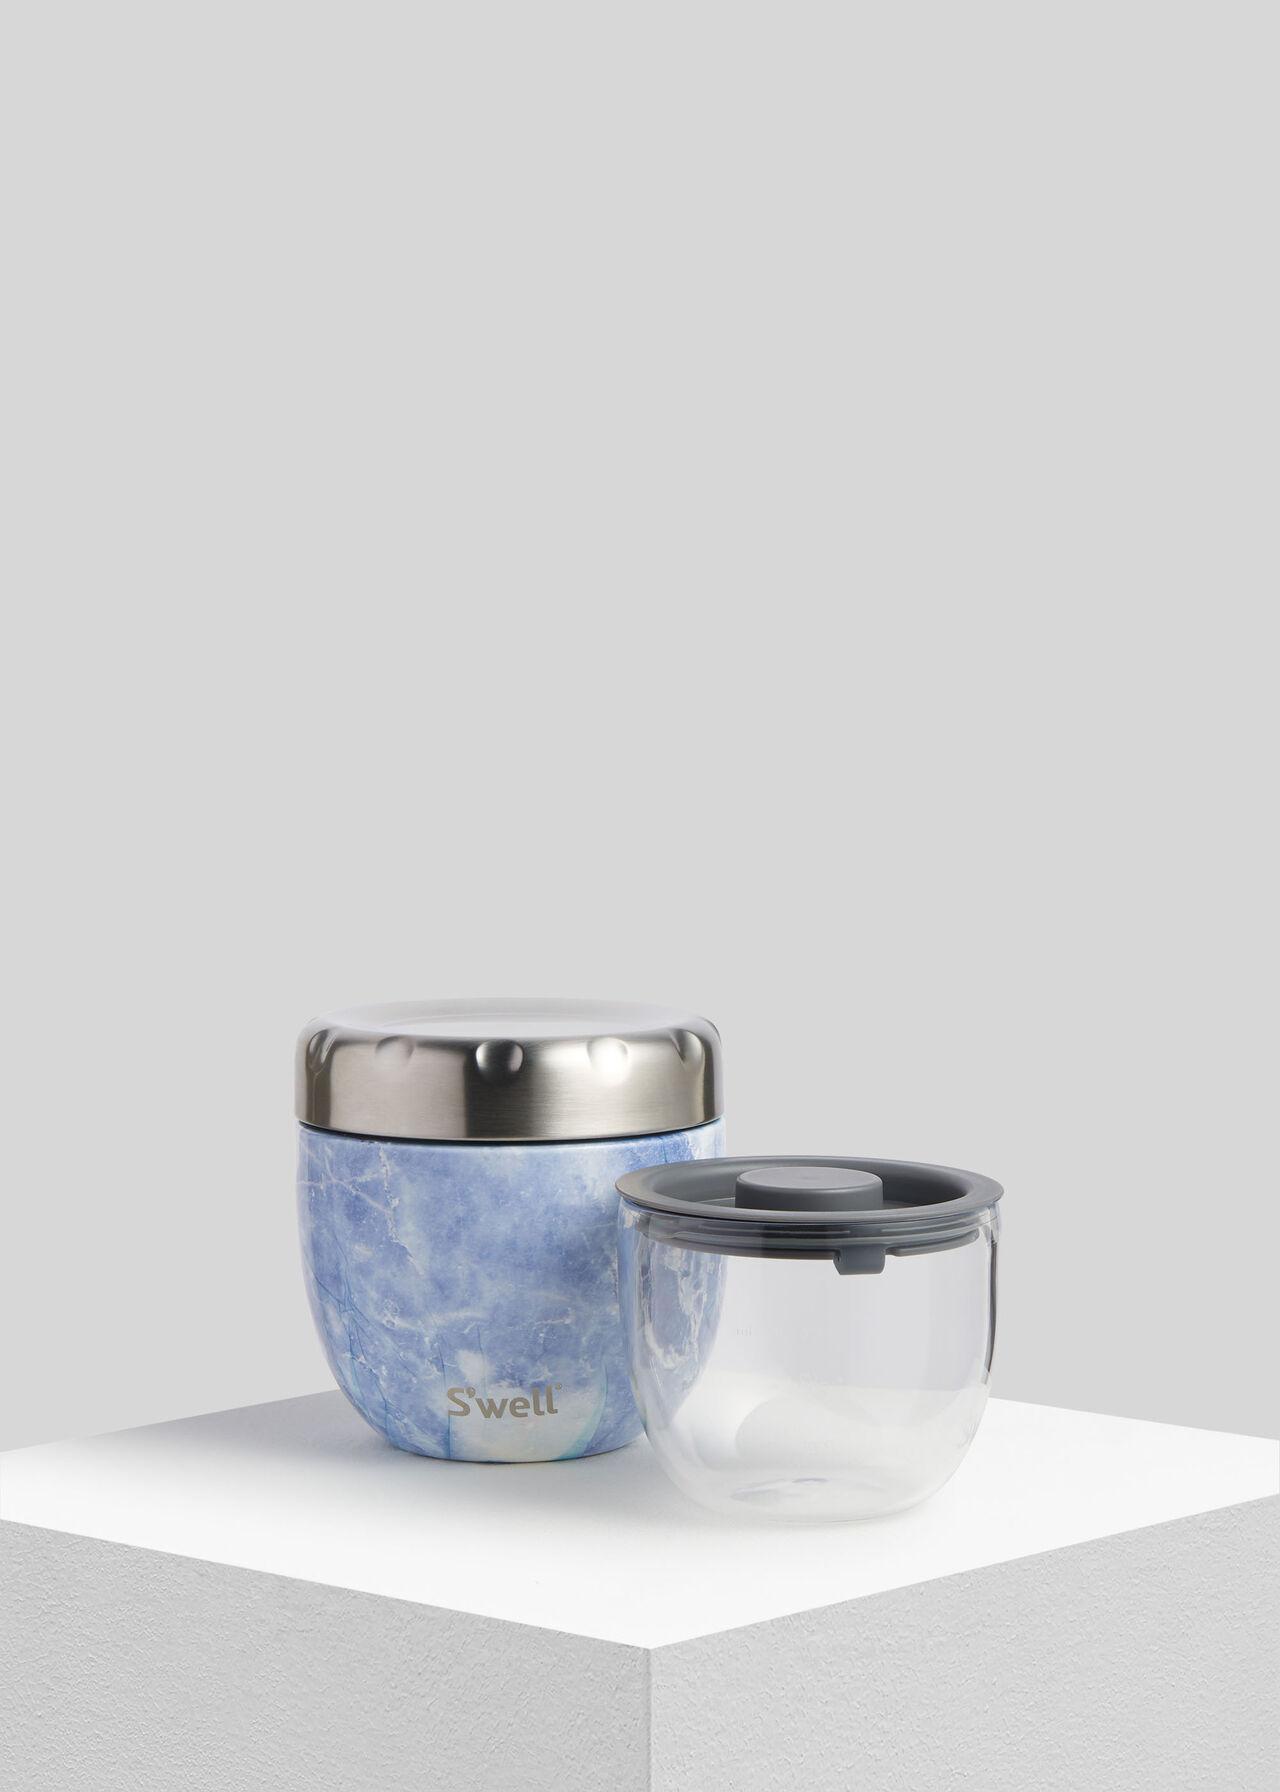 Swell Eats Granite Food Bowl Blue/Multi